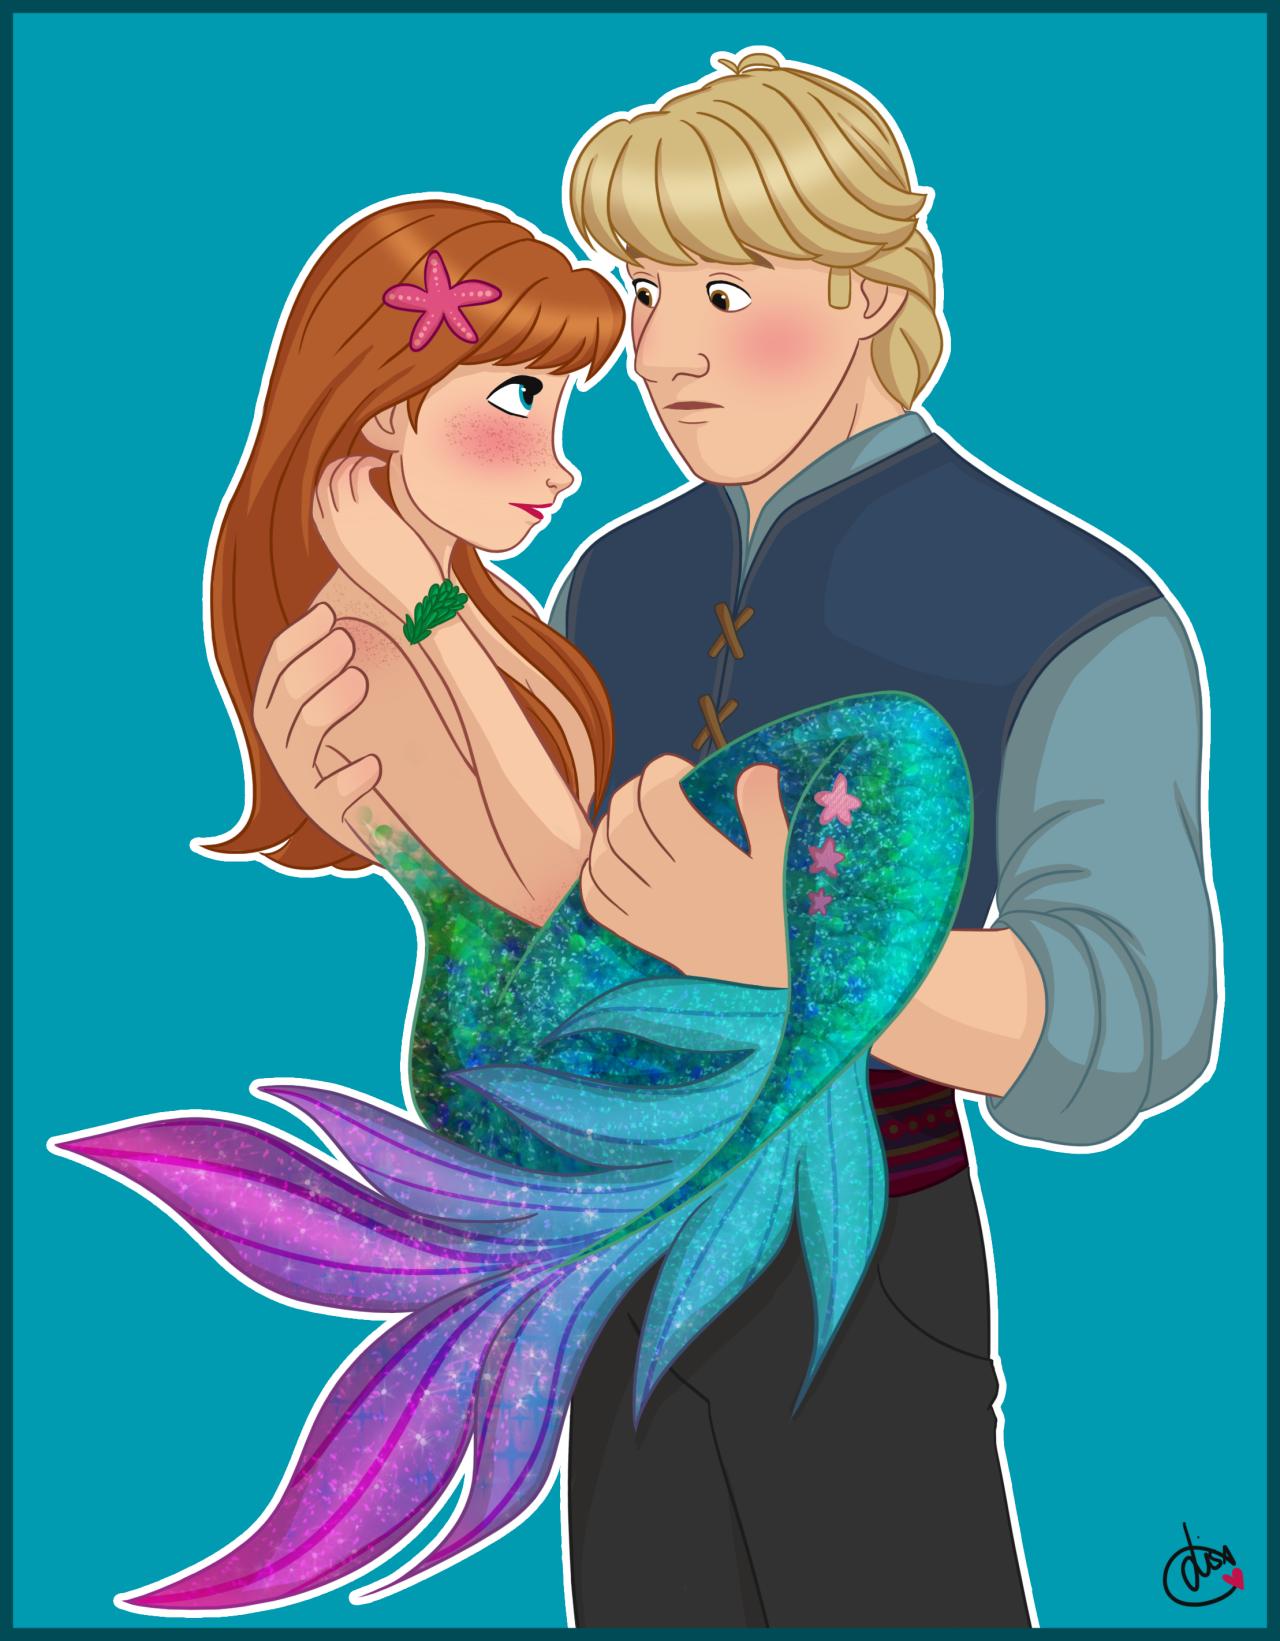 Message, Disney frozen kristoff and anna accept. interesting